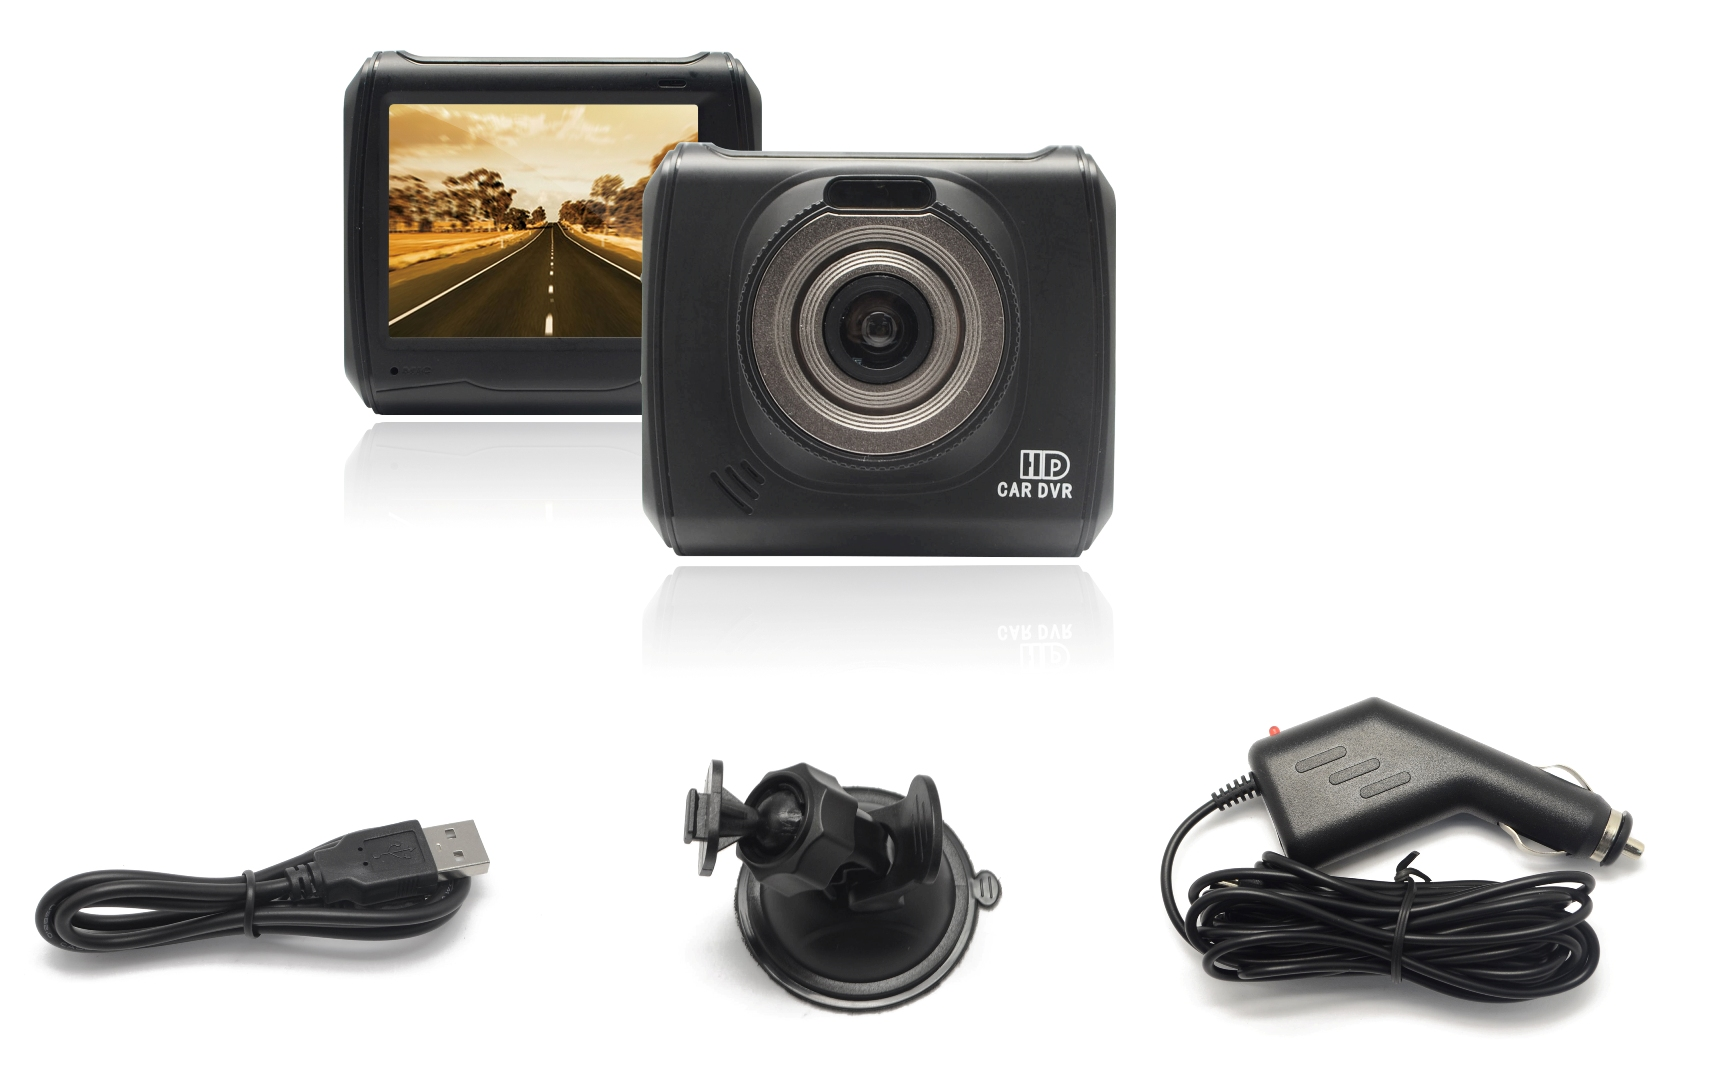 hd dvr recorder videoregistrator auto kamera dashcam blackbox nachtsicht kfz ebay. Black Bedroom Furniture Sets. Home Design Ideas